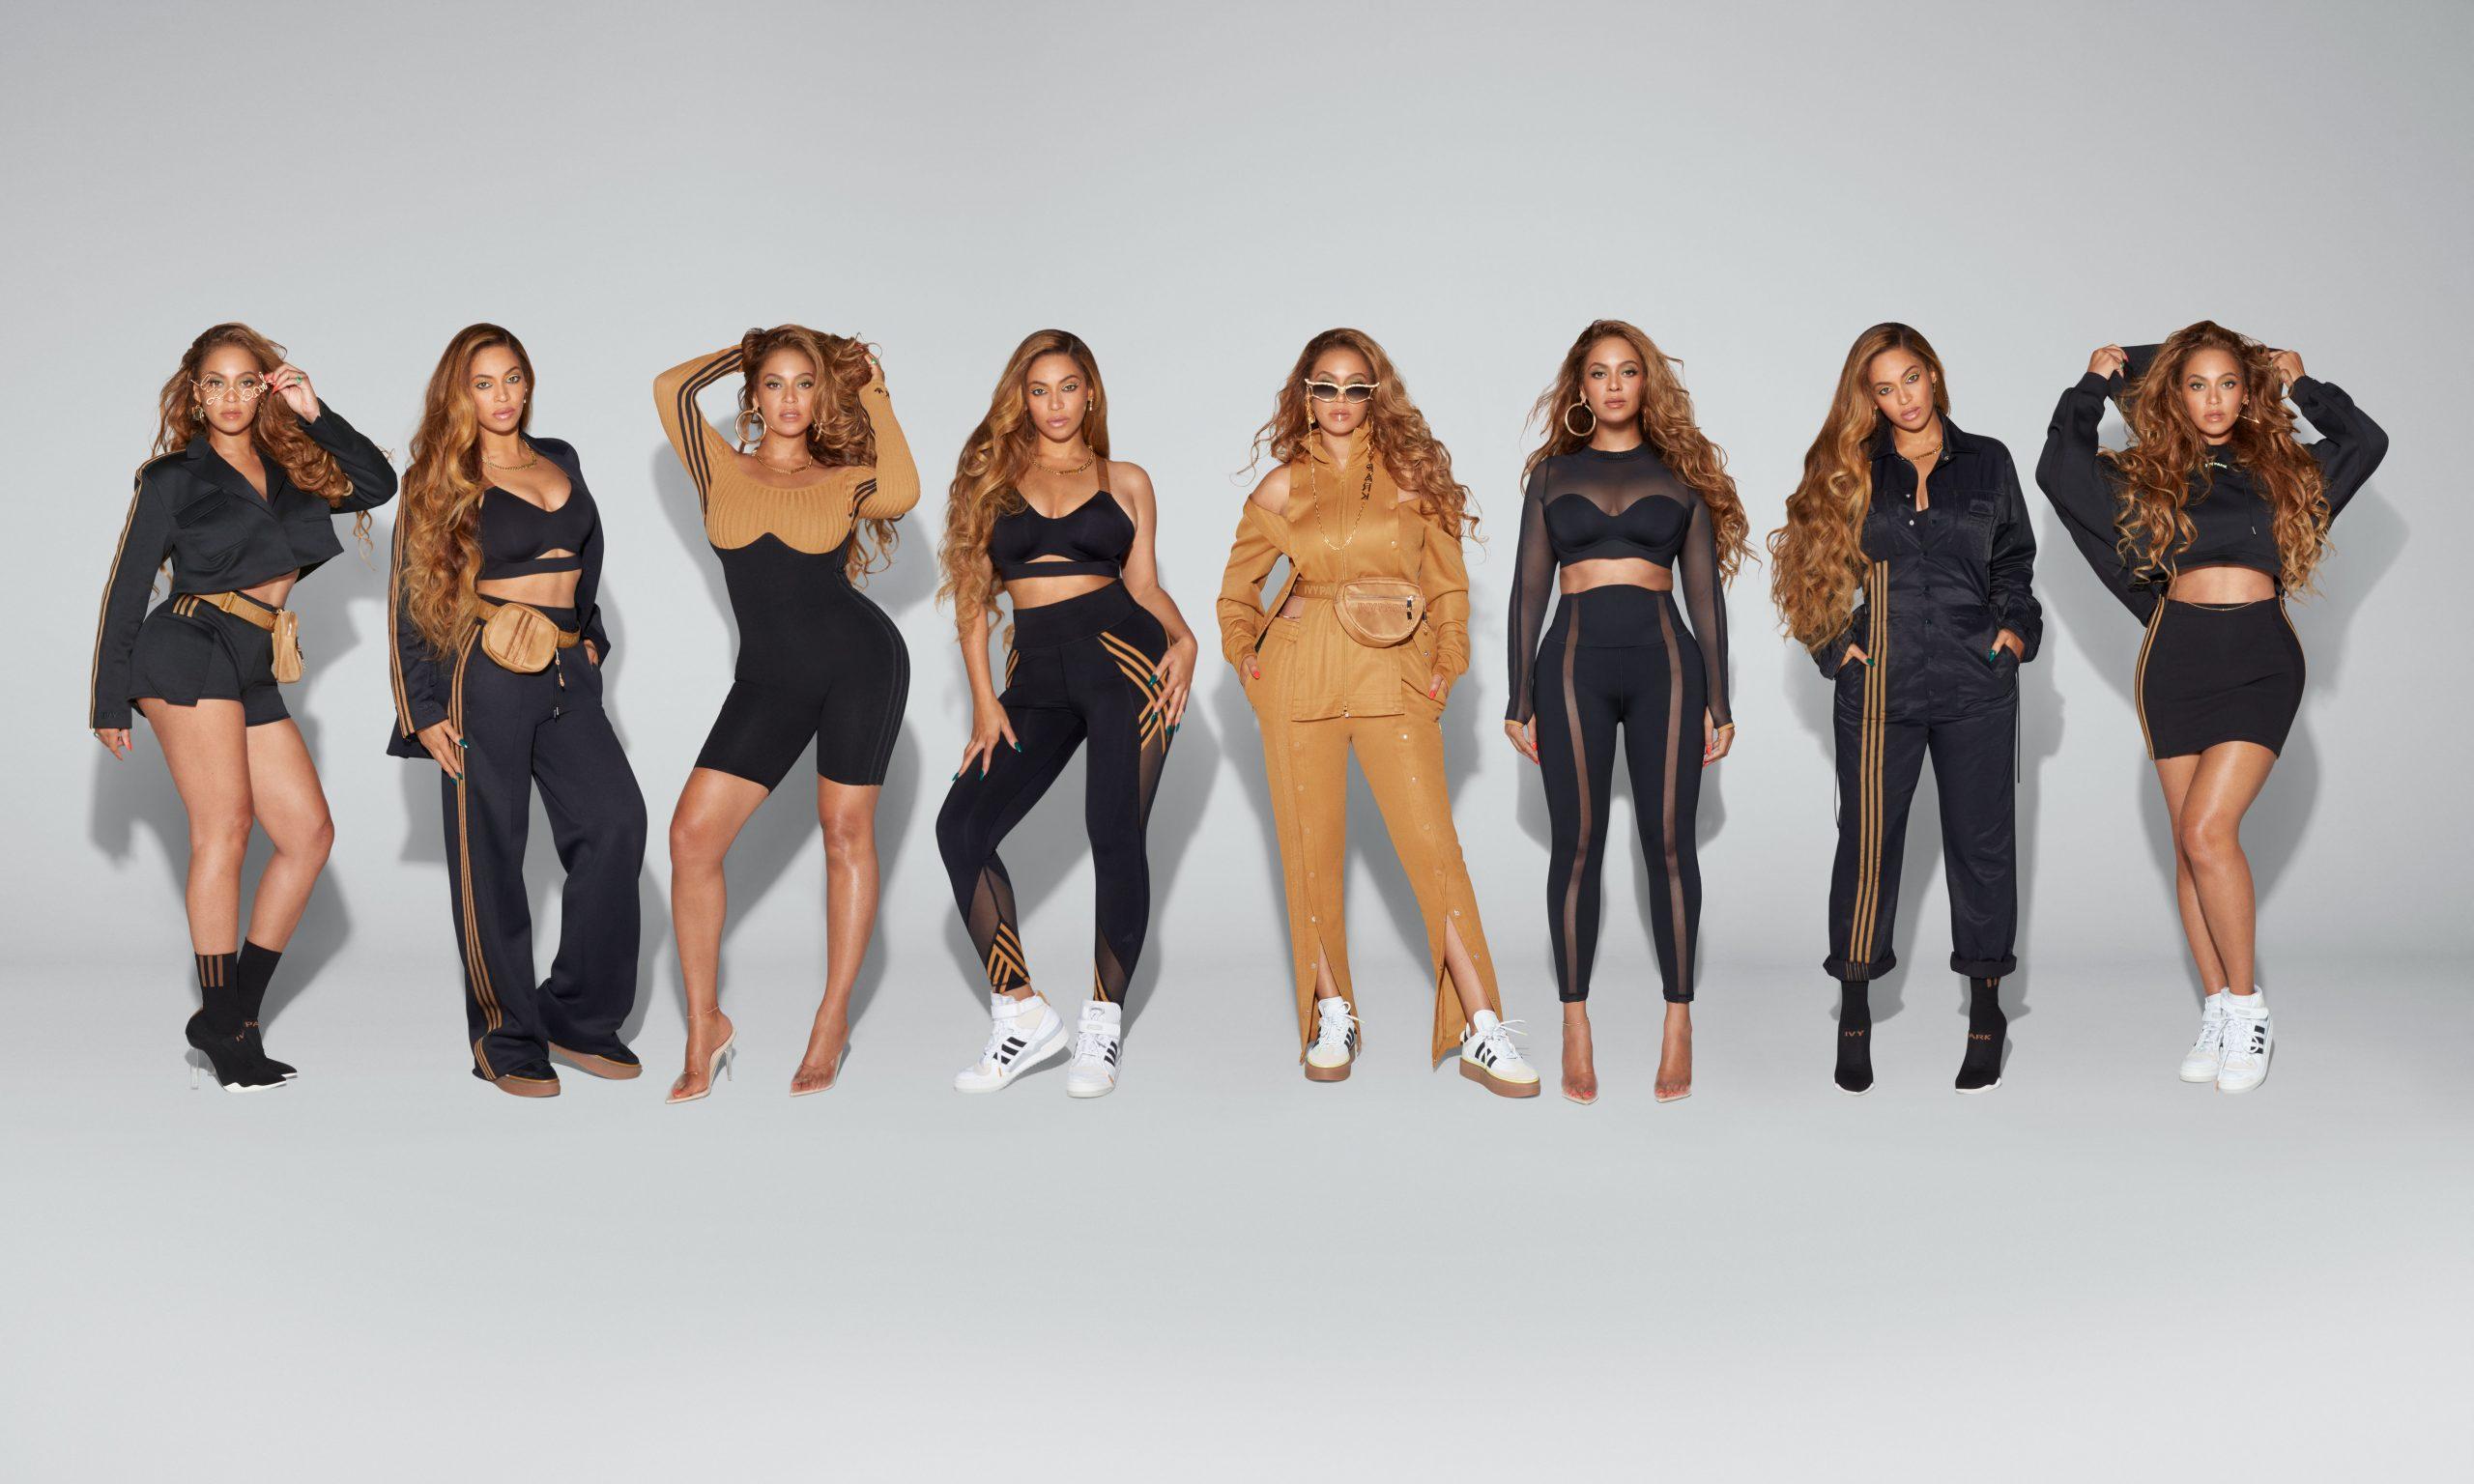 adidas Originals 携手 Beyoncé 推出 #thisismypark#  第二波单品